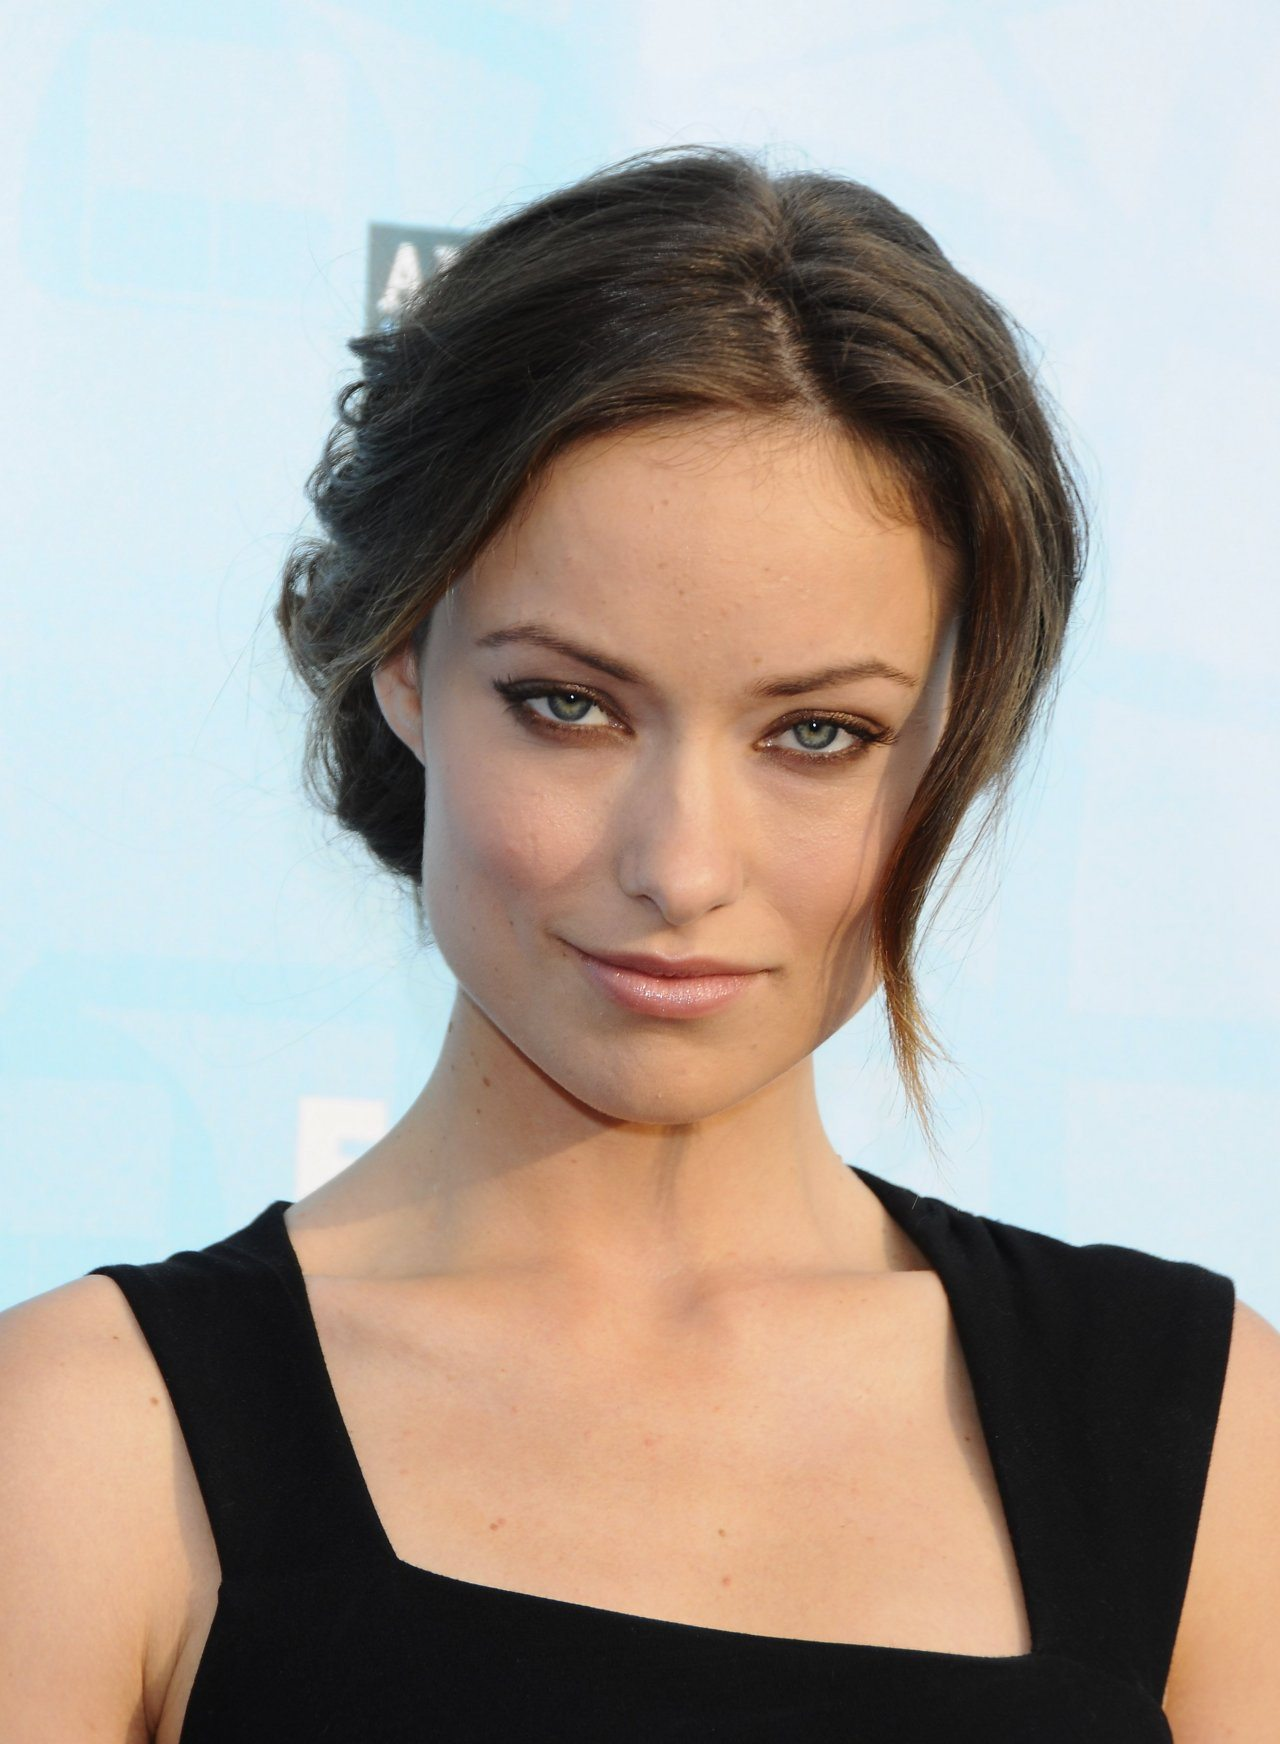 http://media.celebrity-pictures.ca/Celebrities/Olivia-Wilde/Olivia-Wilde-1125660.jpg